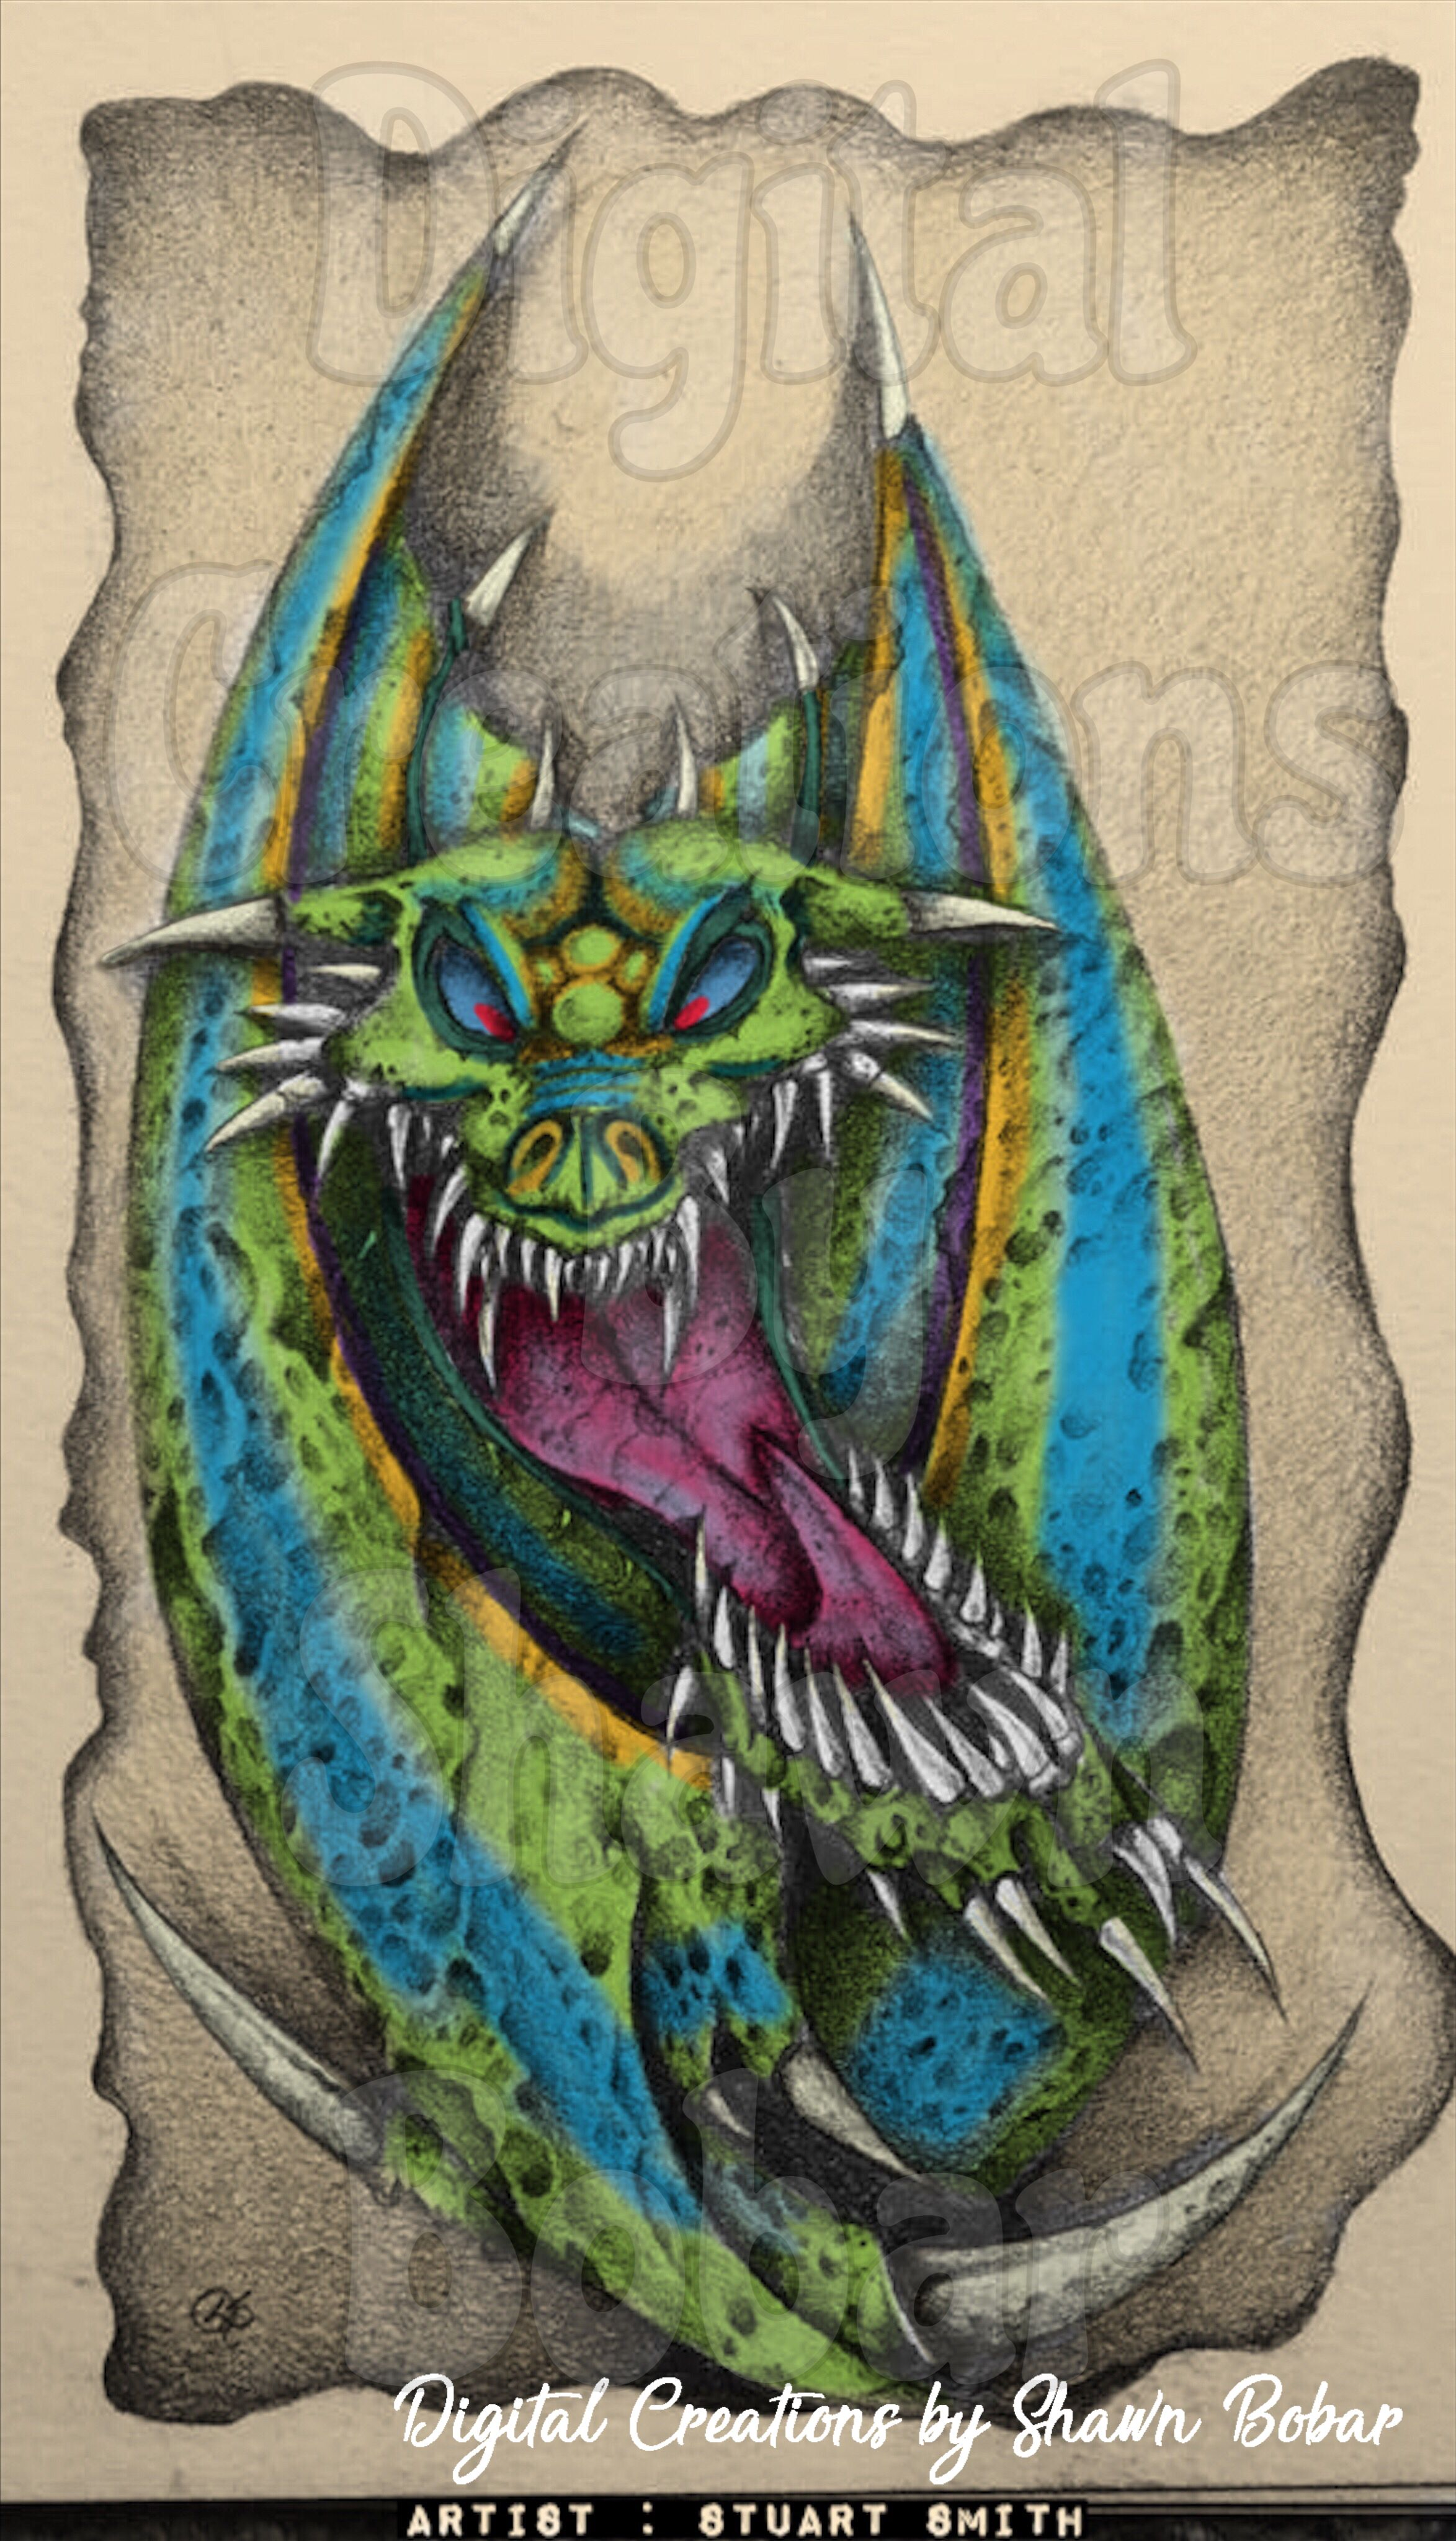 Artist Stuart Smith Digitally colored using Pigment